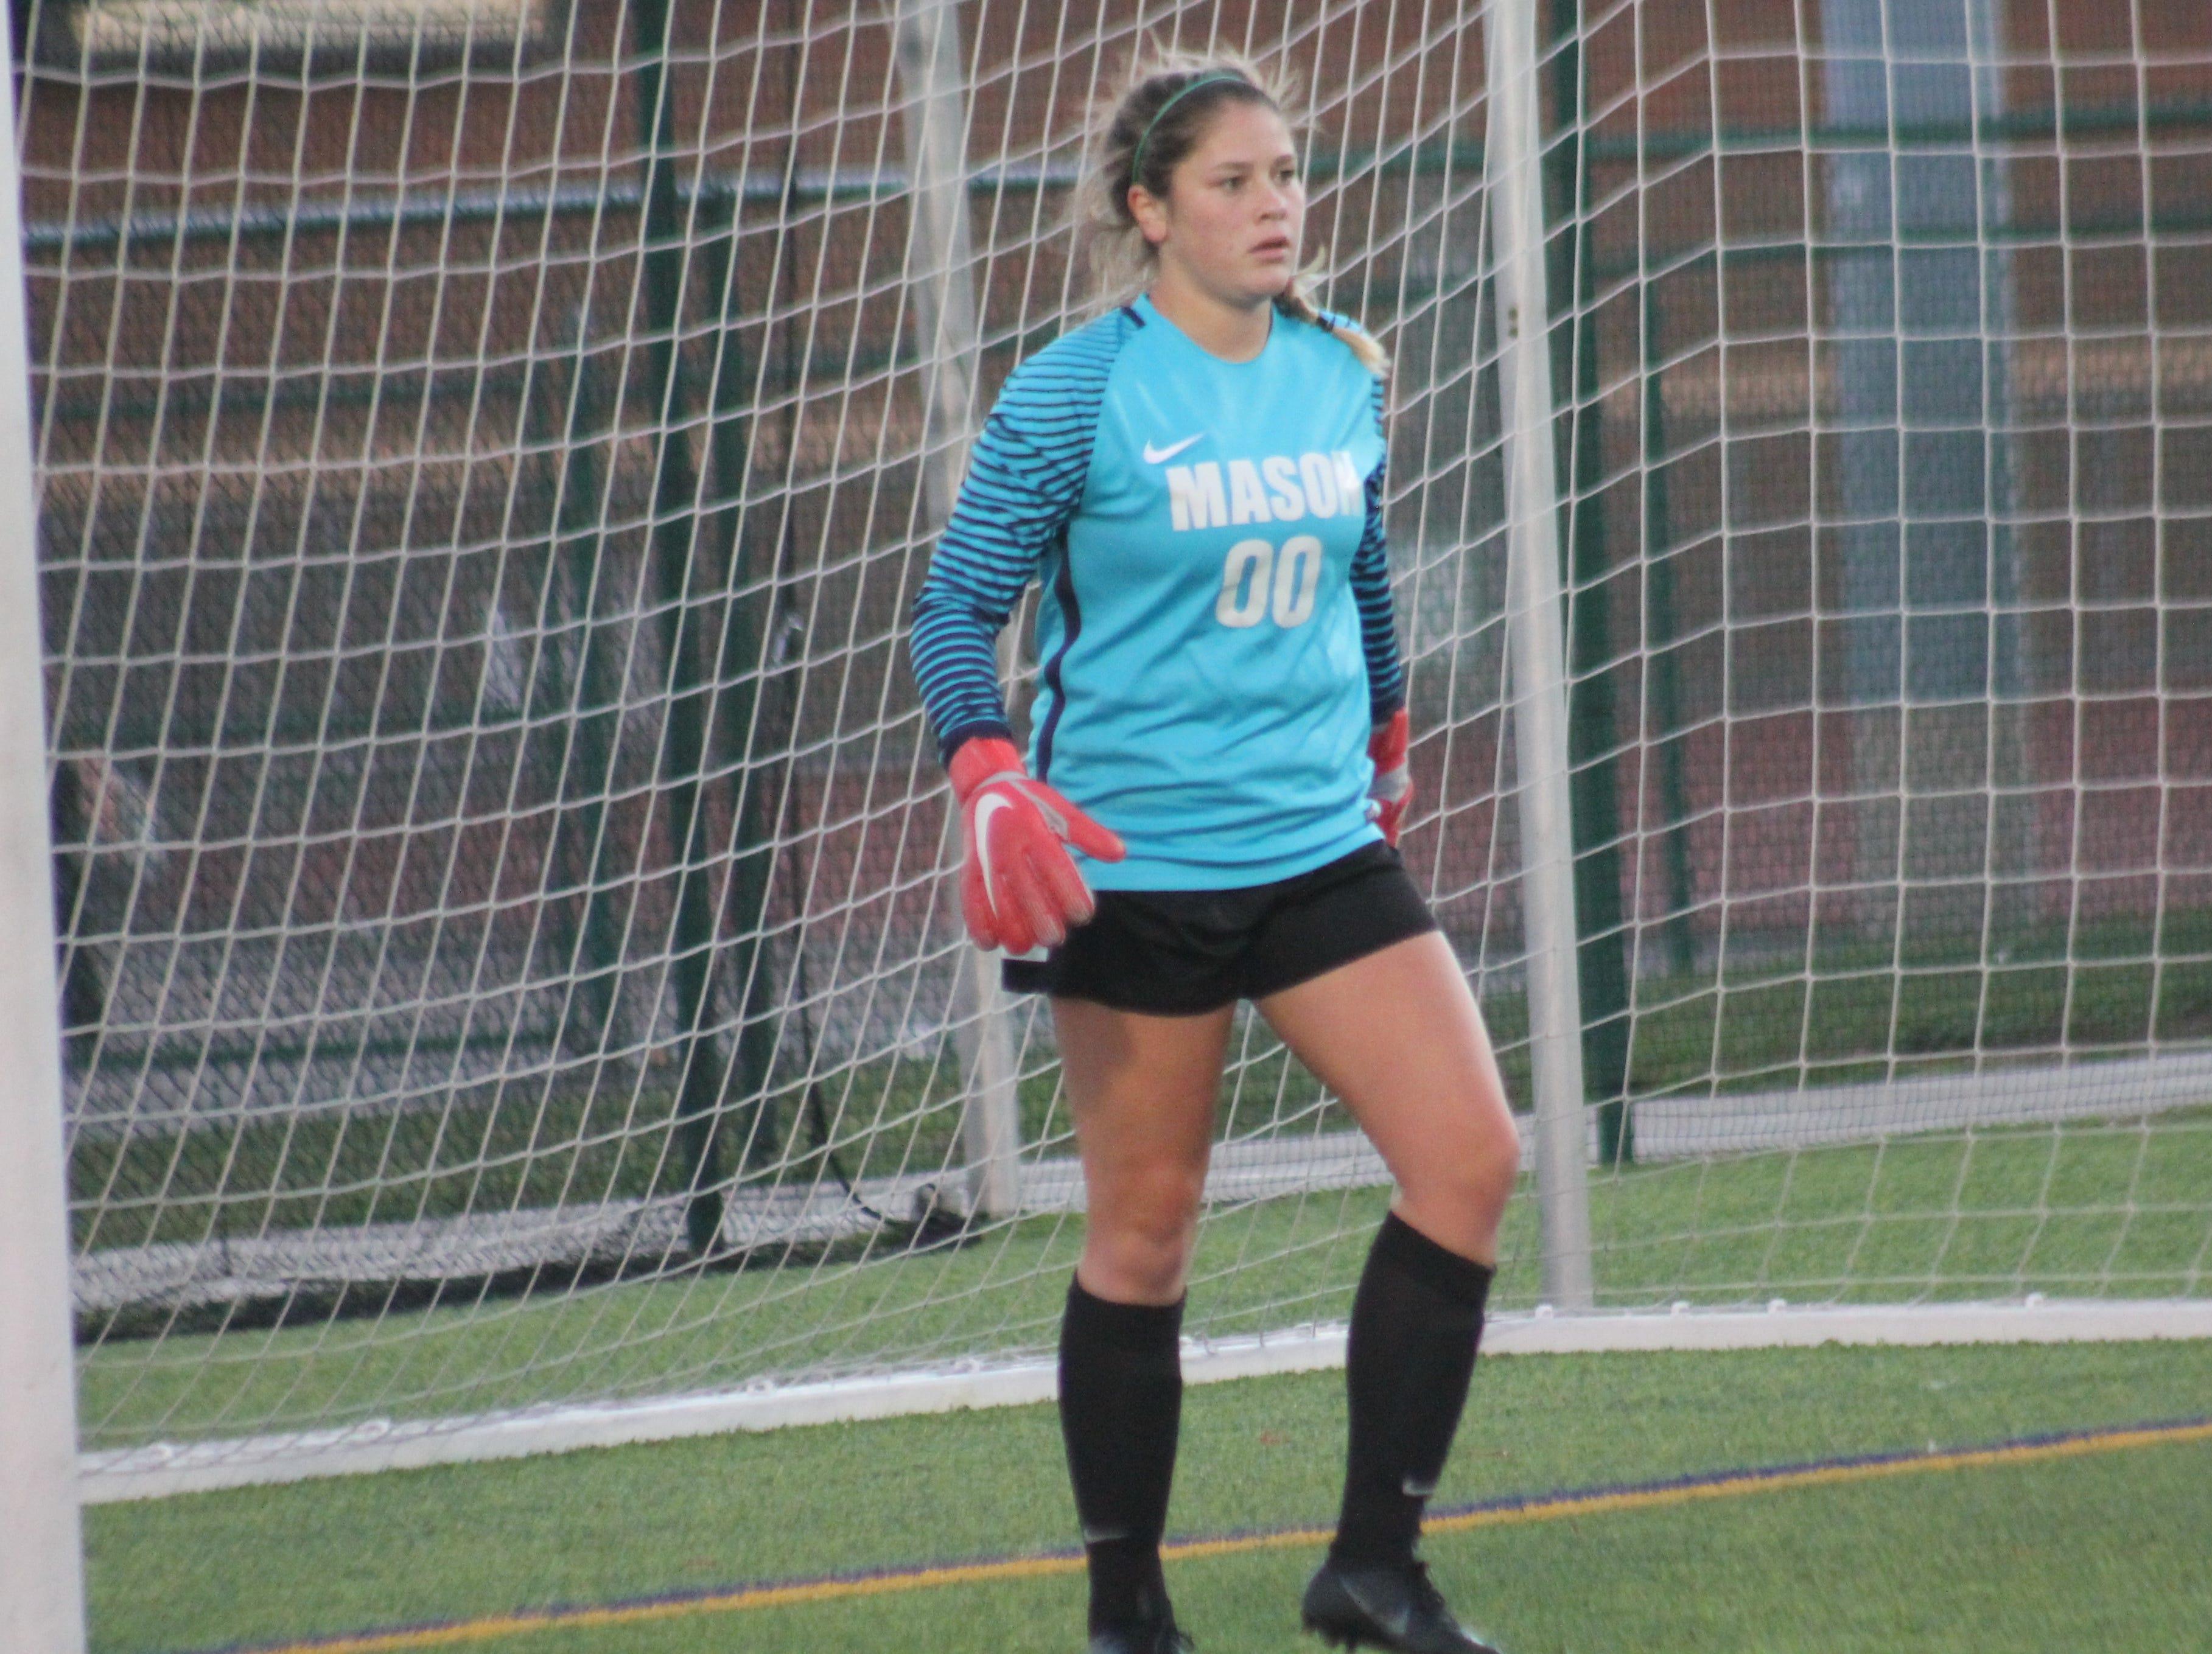 Mason junior goalkeeper Bethany Moser had the shutout against Fairfield 1-0 Oct. 12